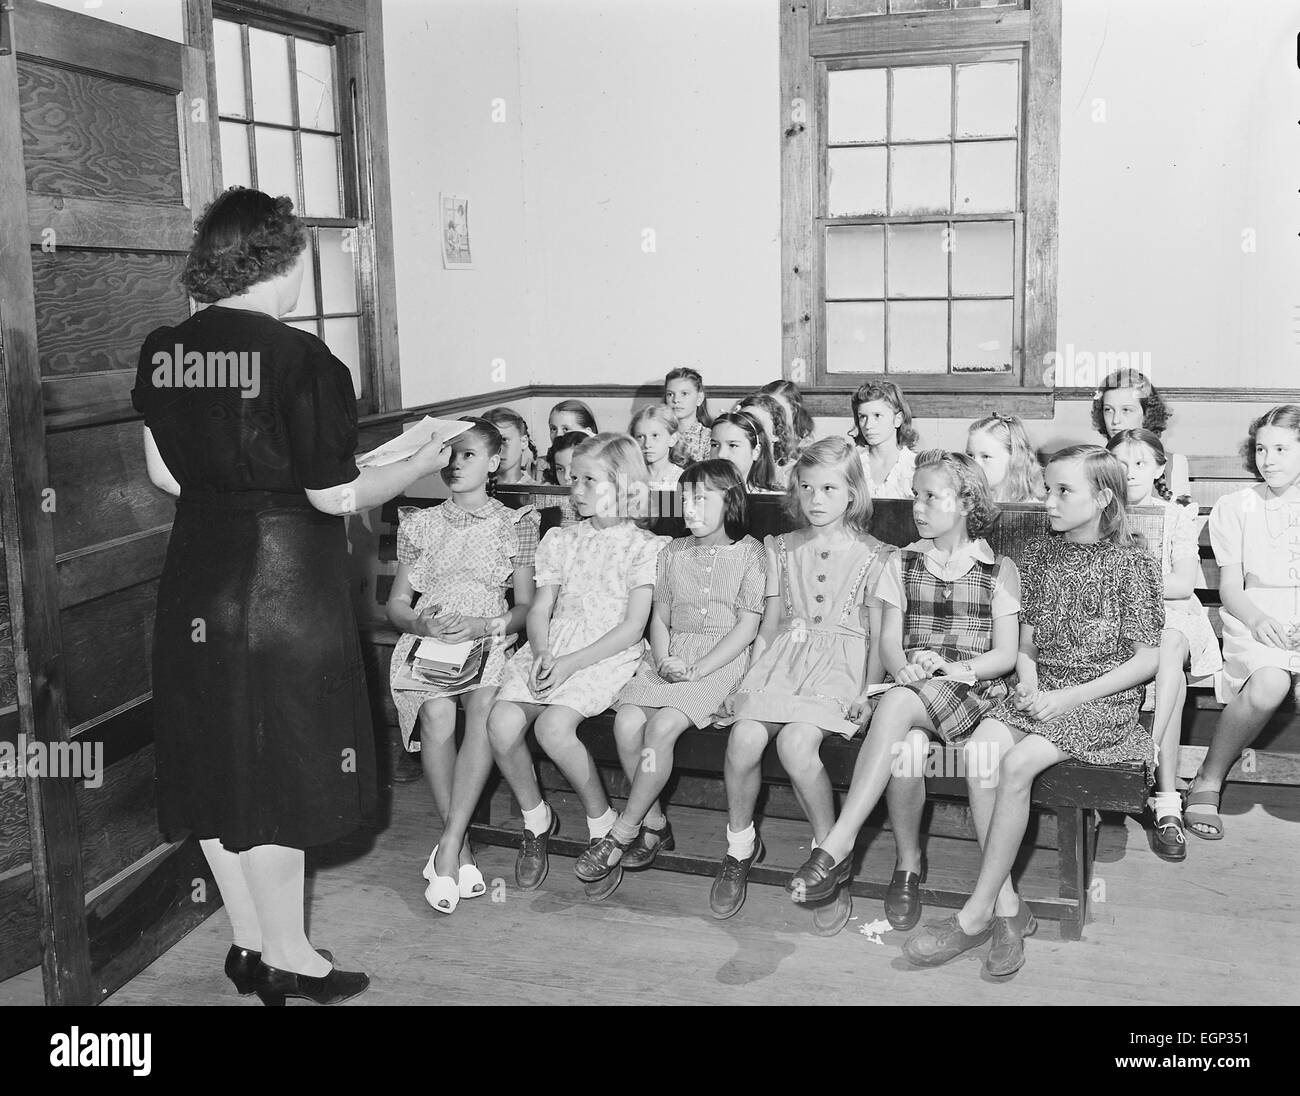 AMERICAN SUNDAY SCHOOL in  Lejunior, Kentucky, September 1946. Photo: US Dept of the Interior Stock Photo